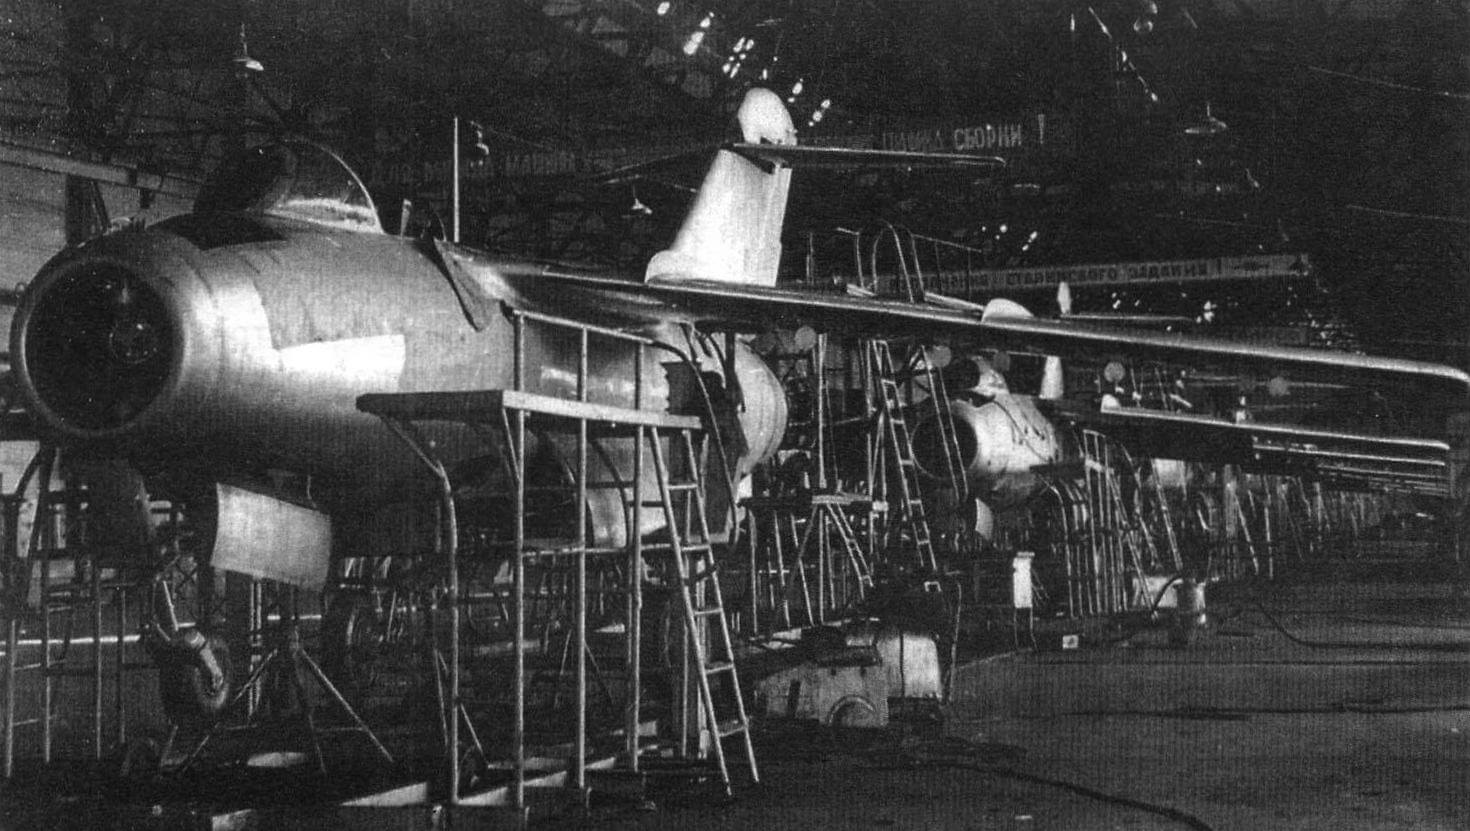 Сборка Ла-15 на заводе № 21